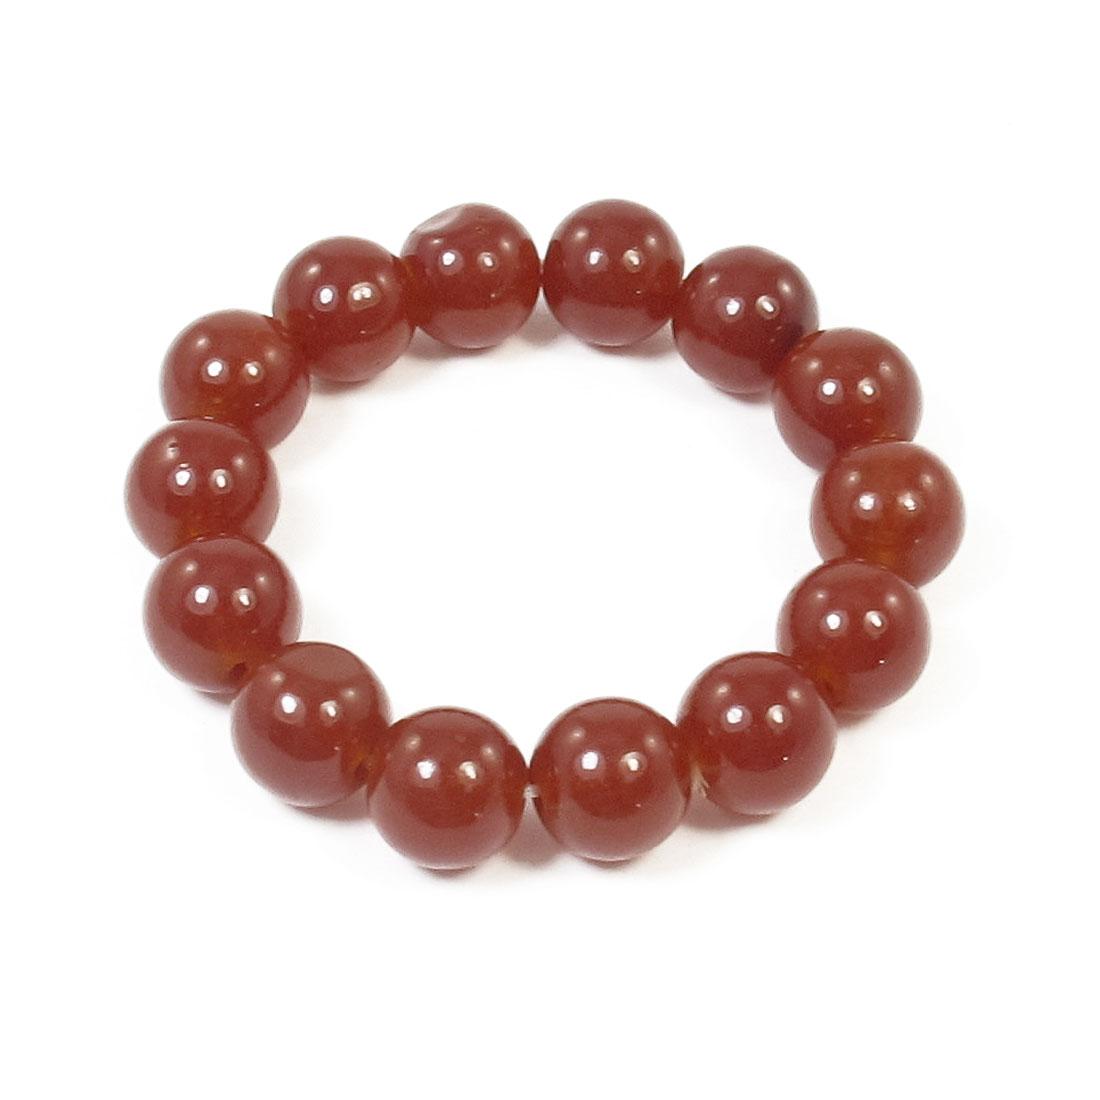 1.4cm Dia Wine Red Beads Decor Elastic Band Wrist String Bracelet